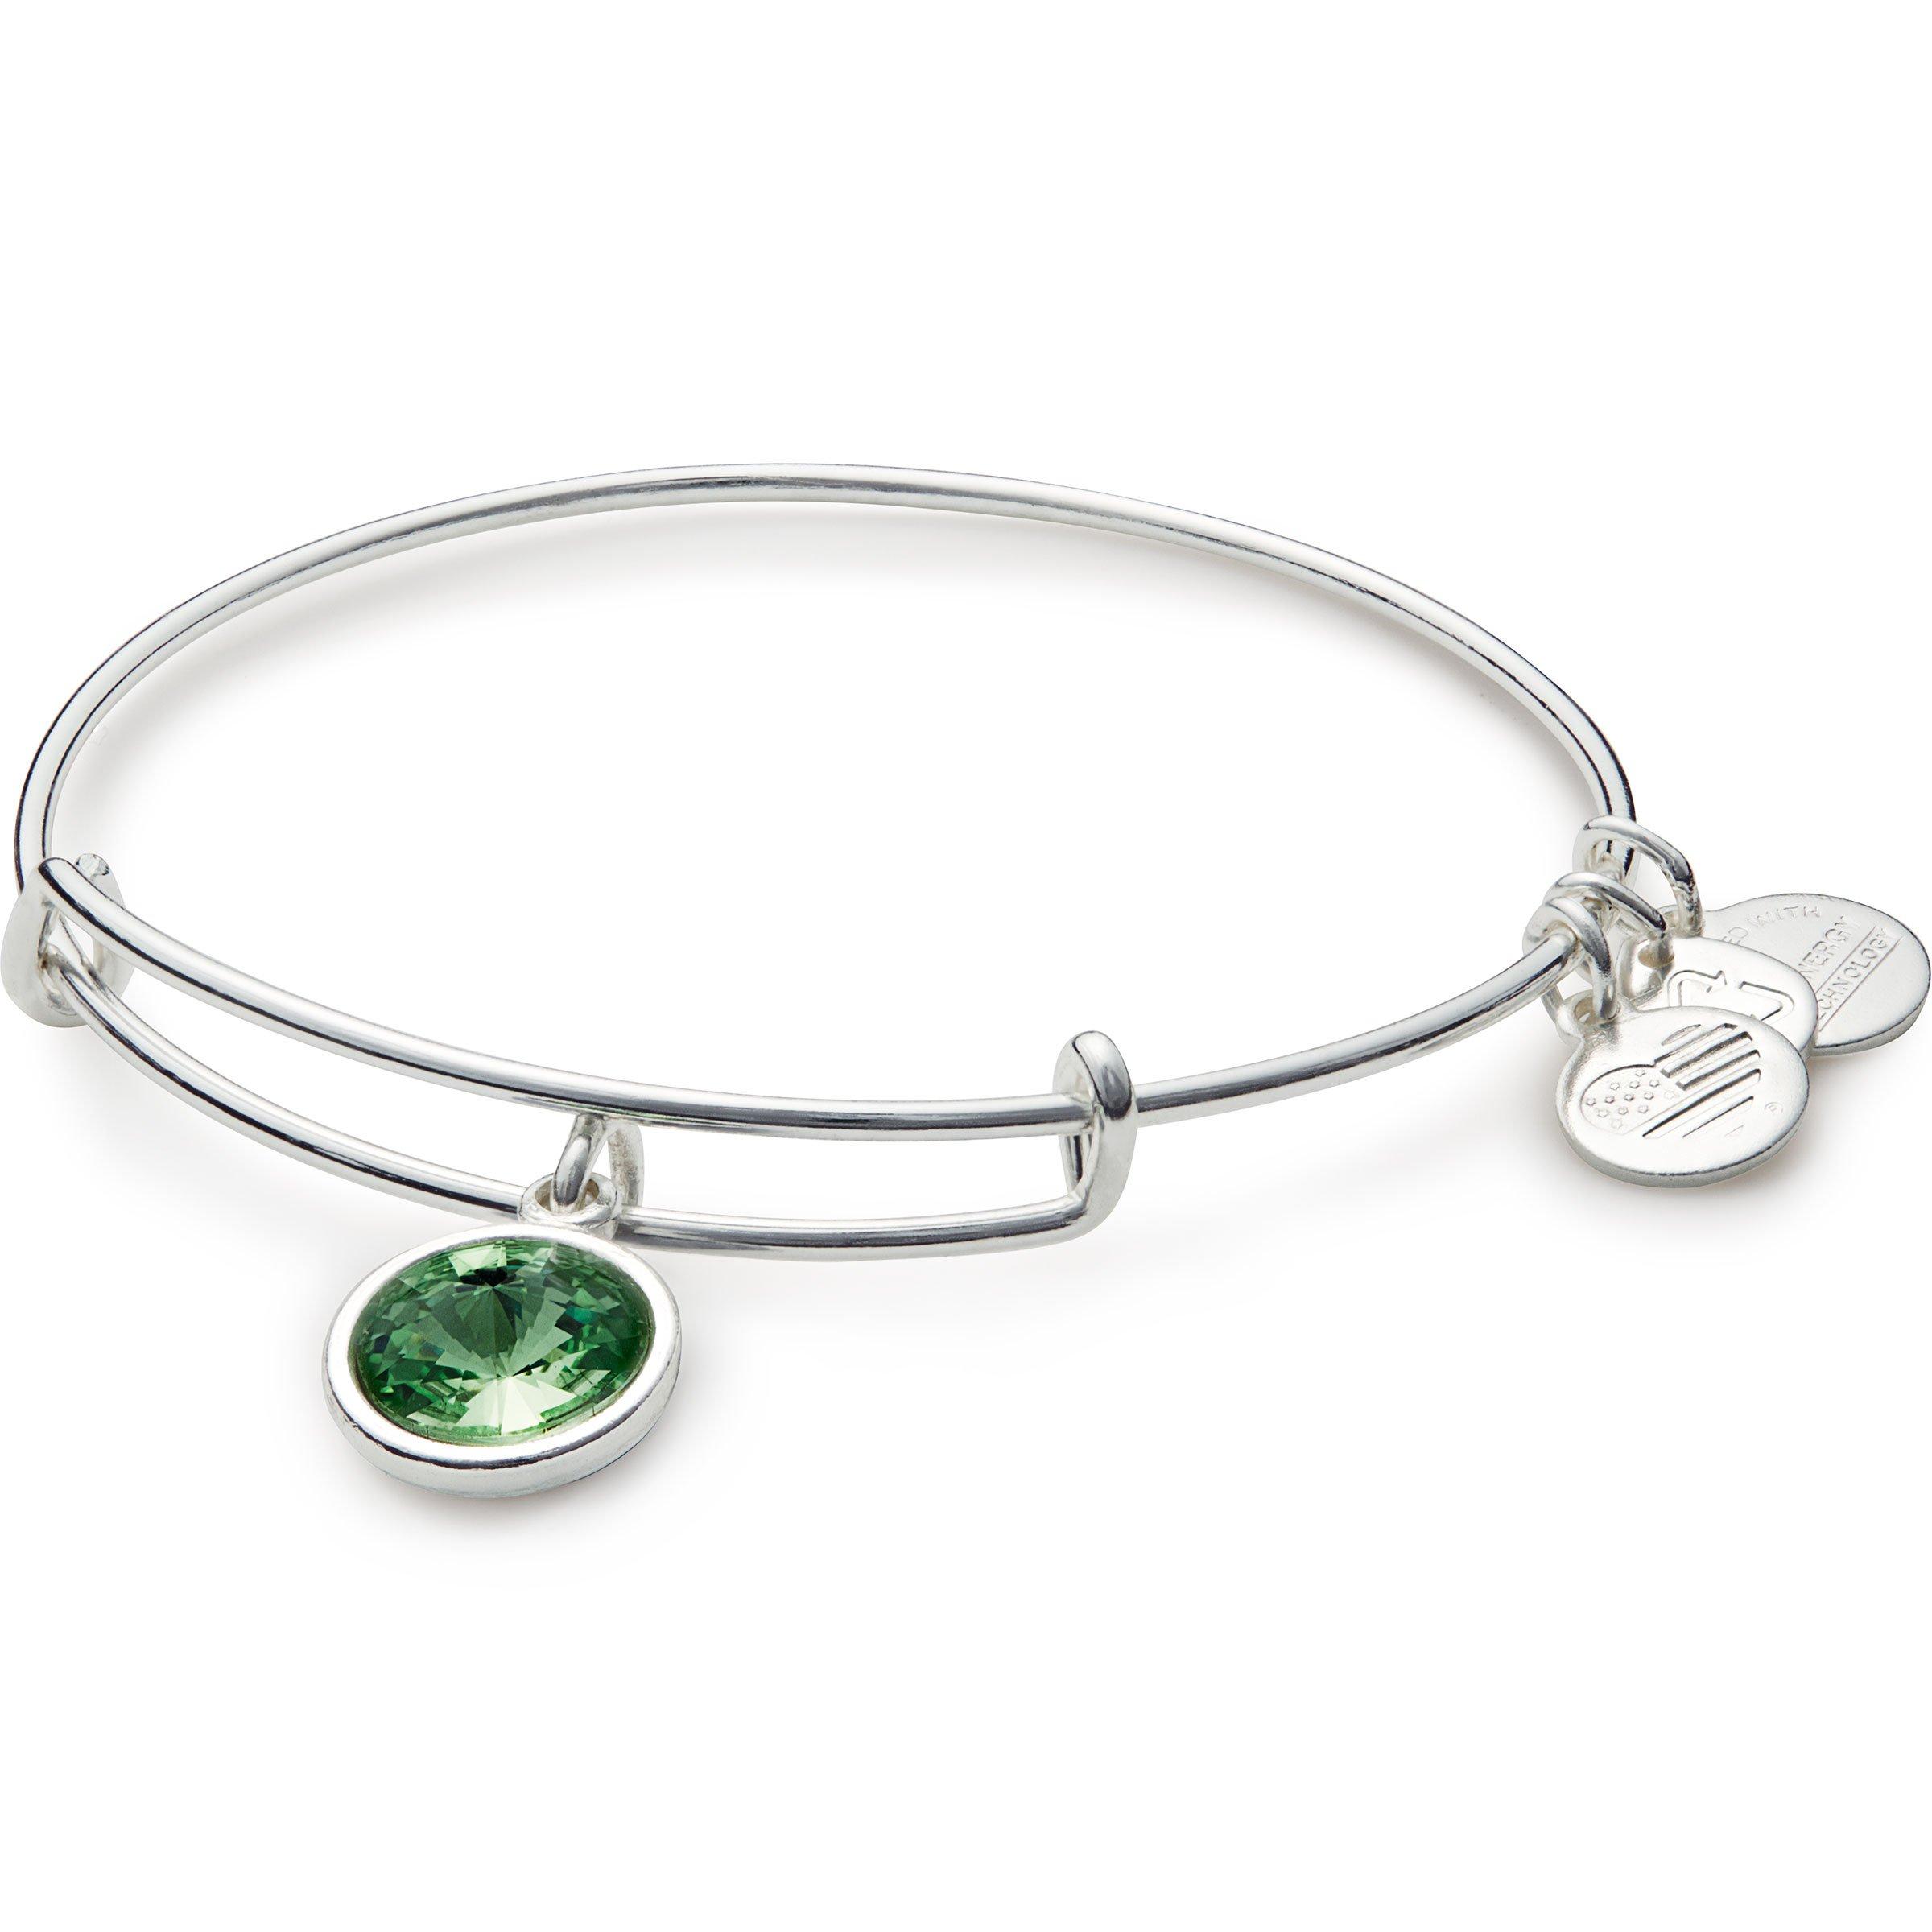 Alex and Ani Bangle Bar August Imitation Birthstone Shiny-Silver Tone Expandable Bracelet